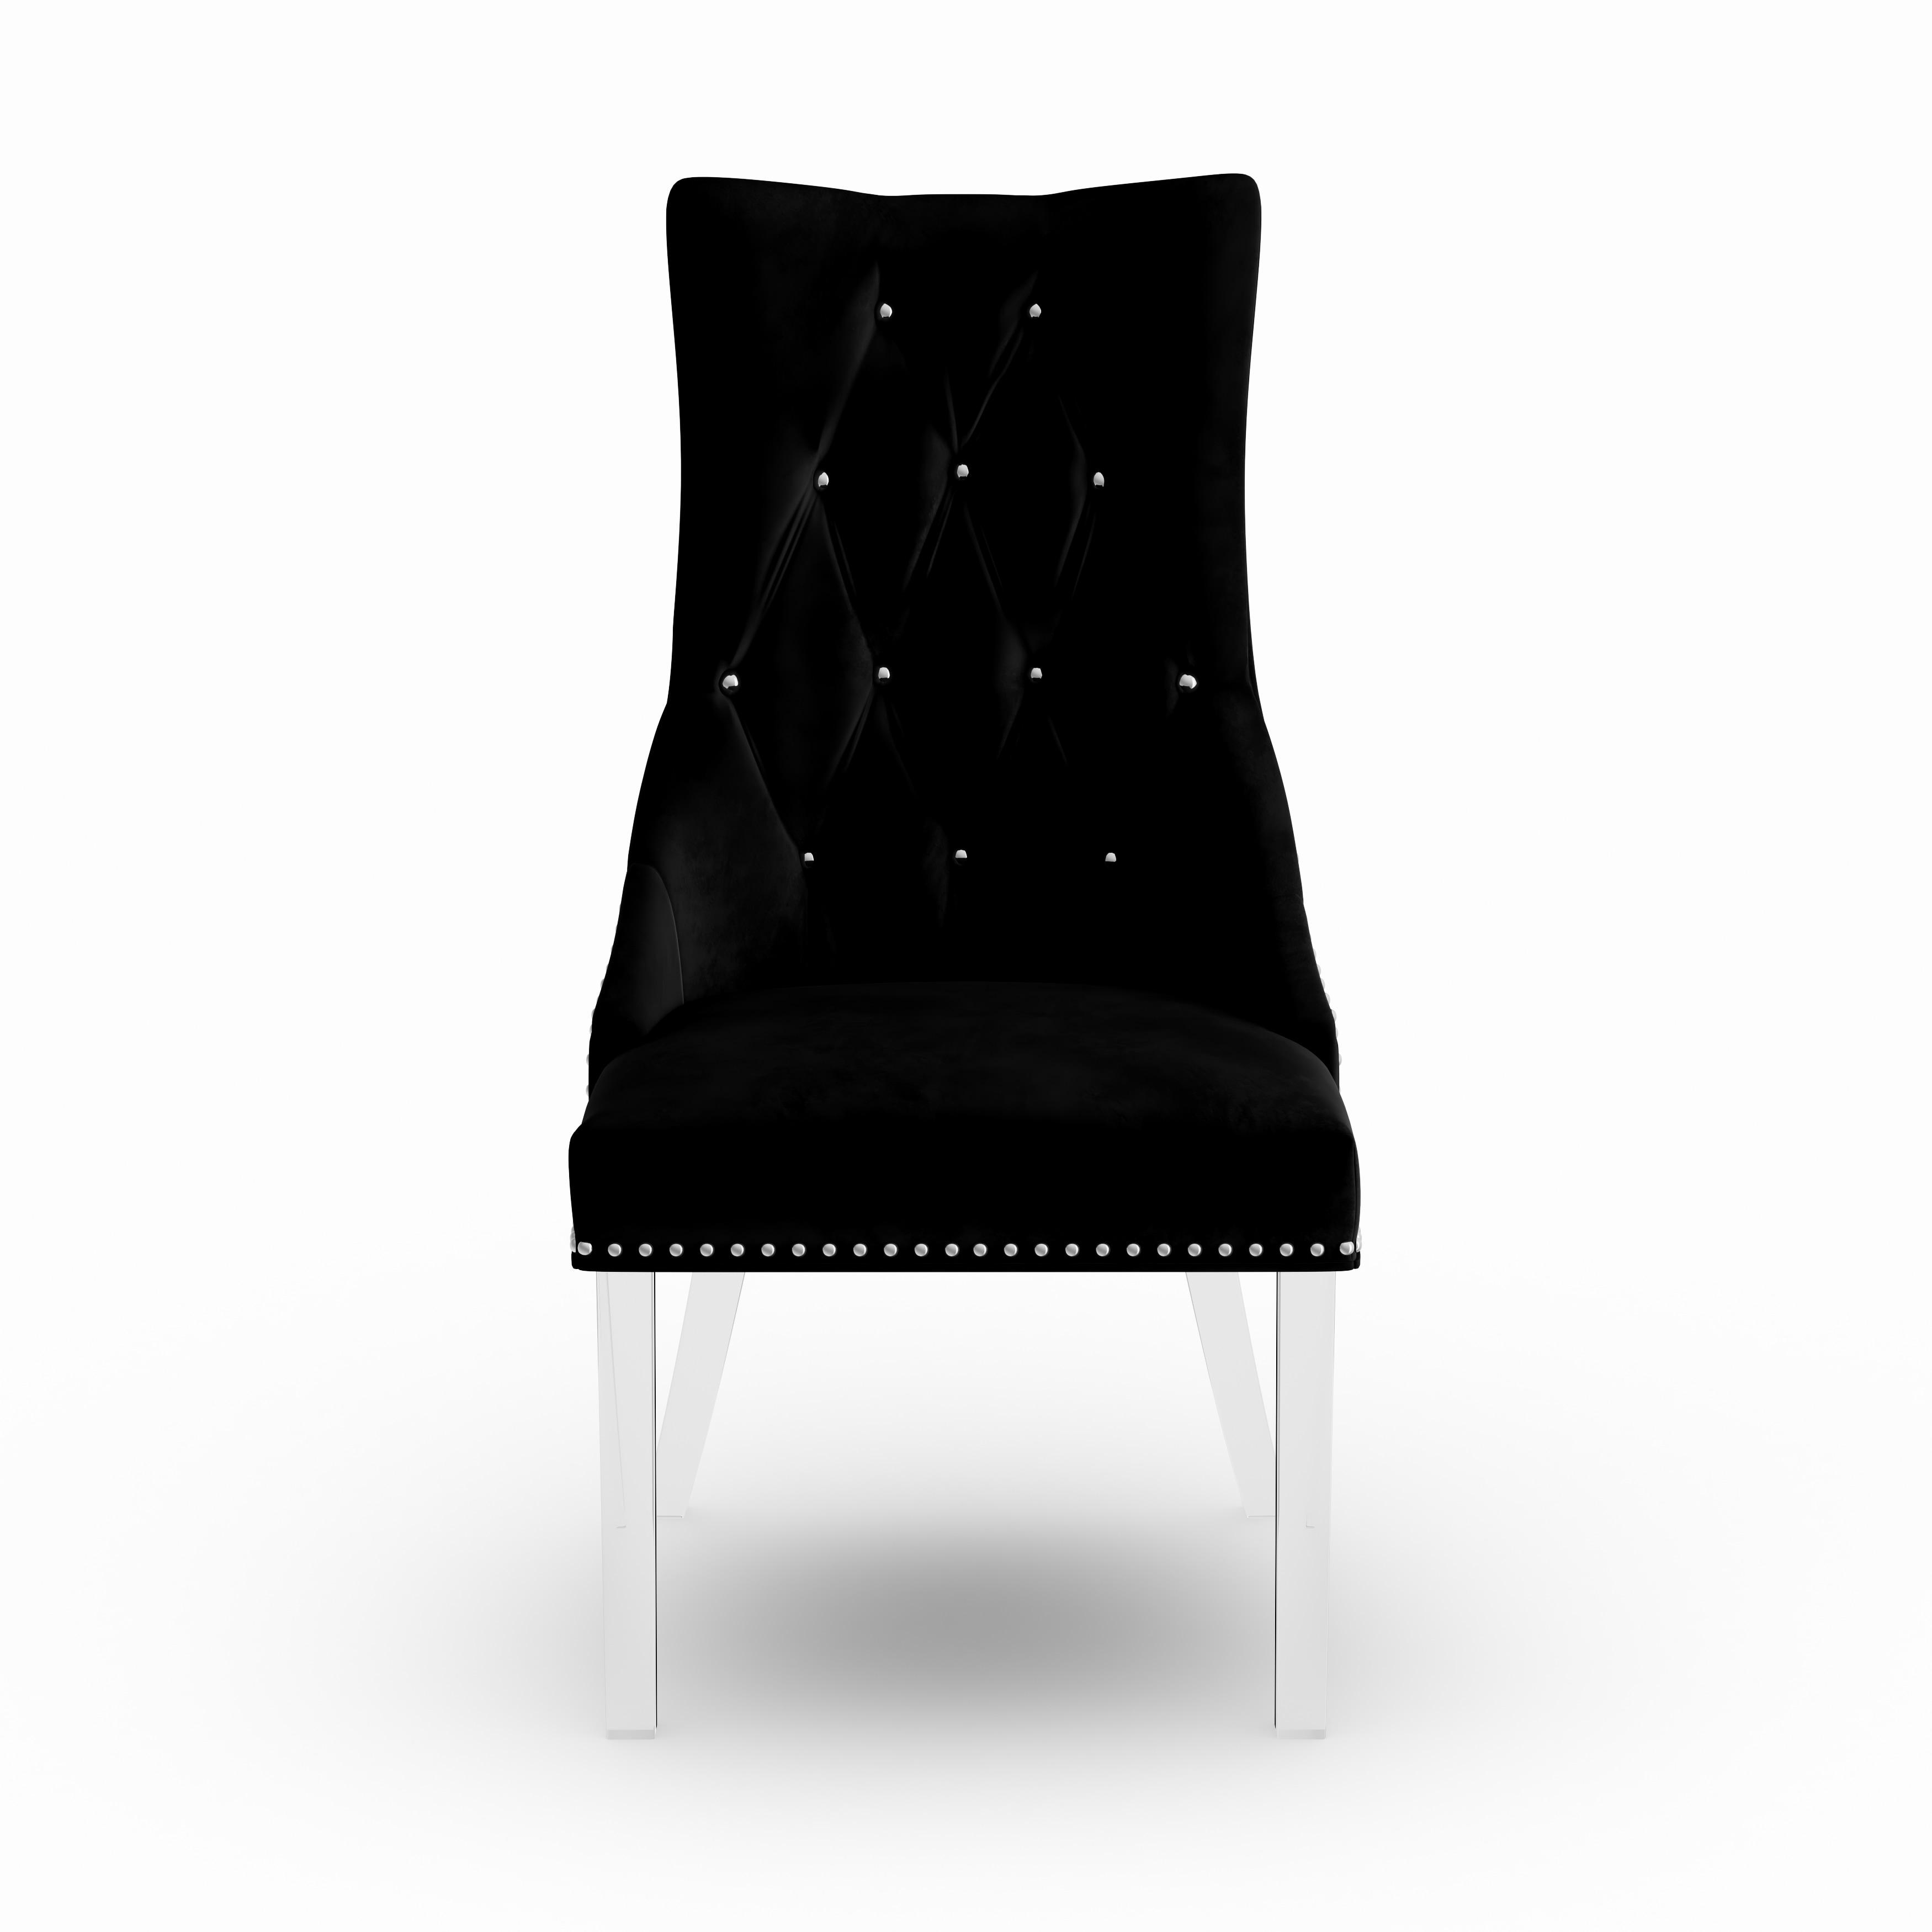 Shop Armen Living Gobi Tufted Dining Chair In Velvet With Acrylic